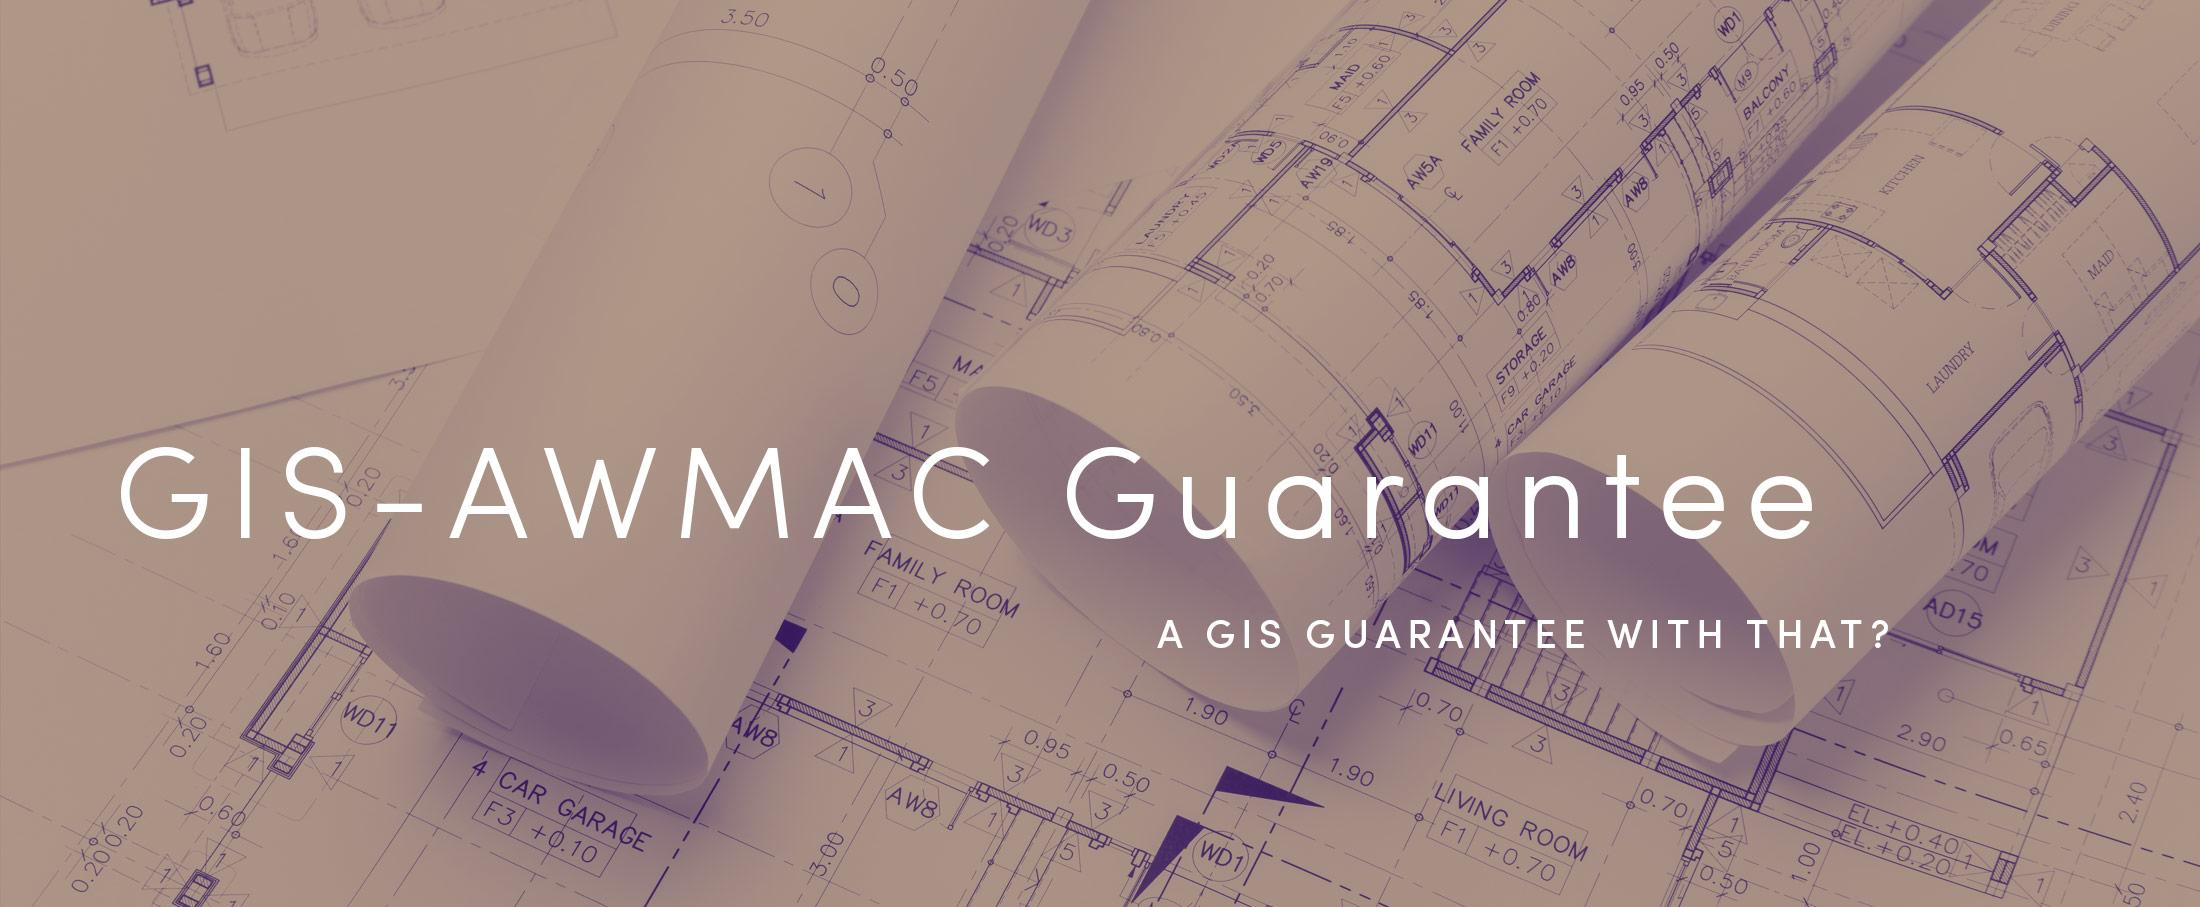 GIS-AWMAC Guarantee